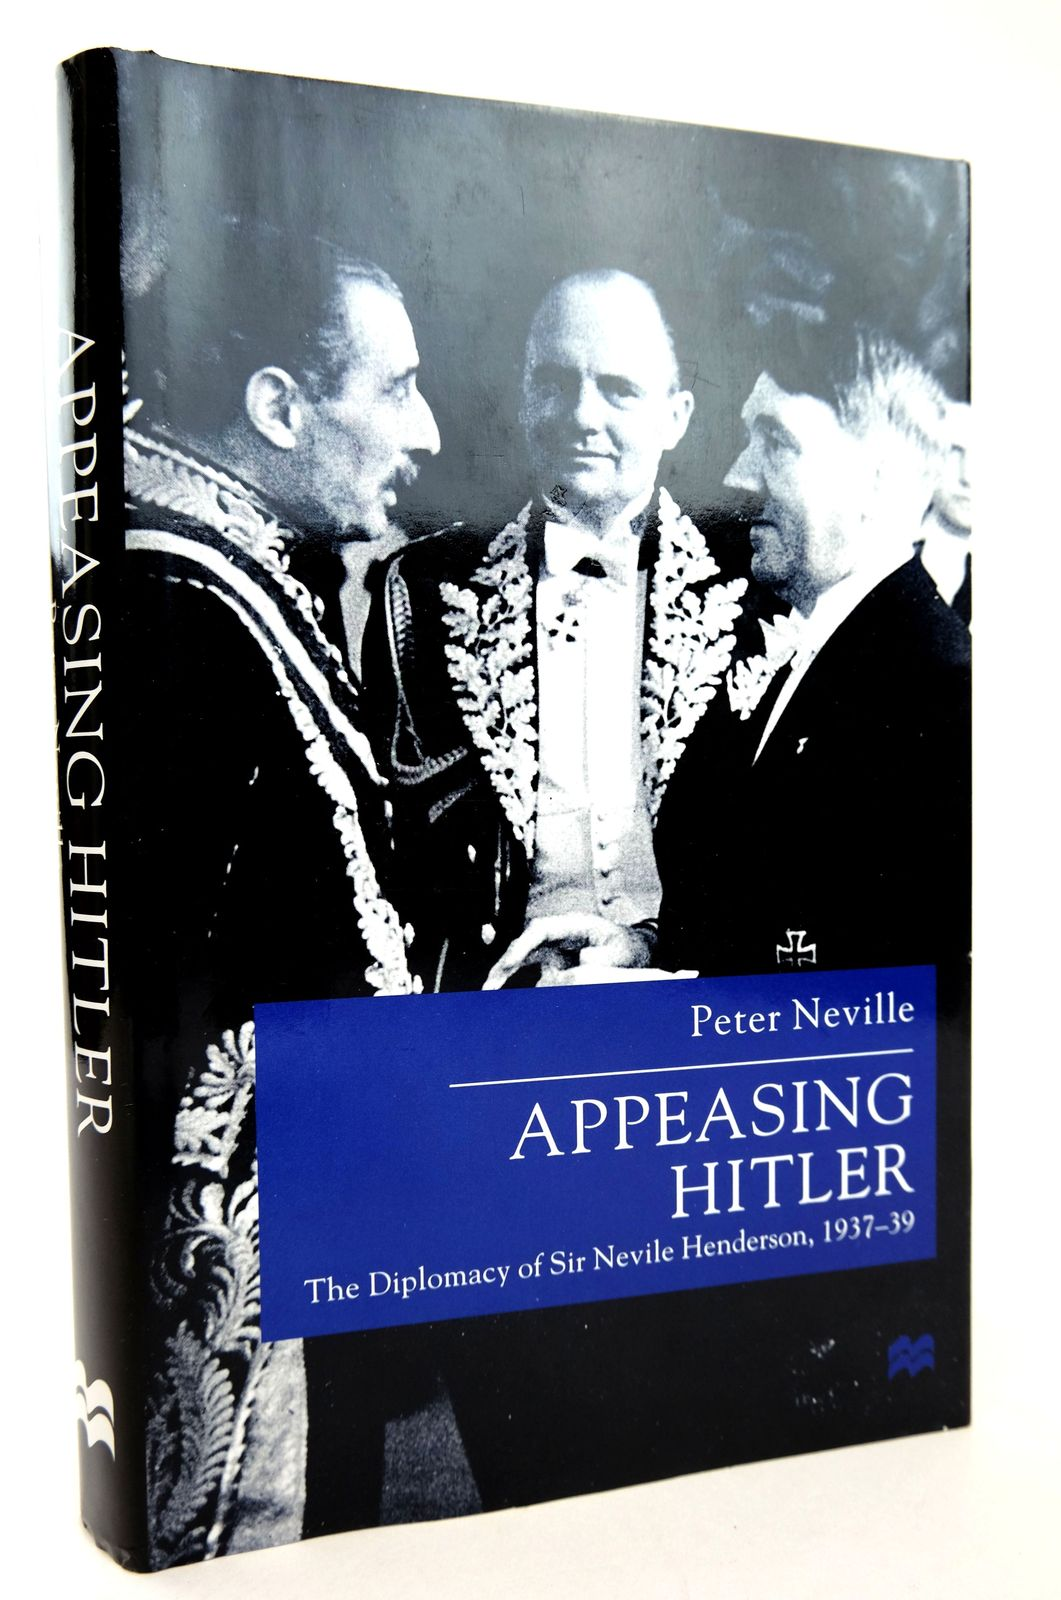 Photo of APPEASING HITLER: THE DIPLOMACY OF SIR NEVILE HENDERSON, 1937-39